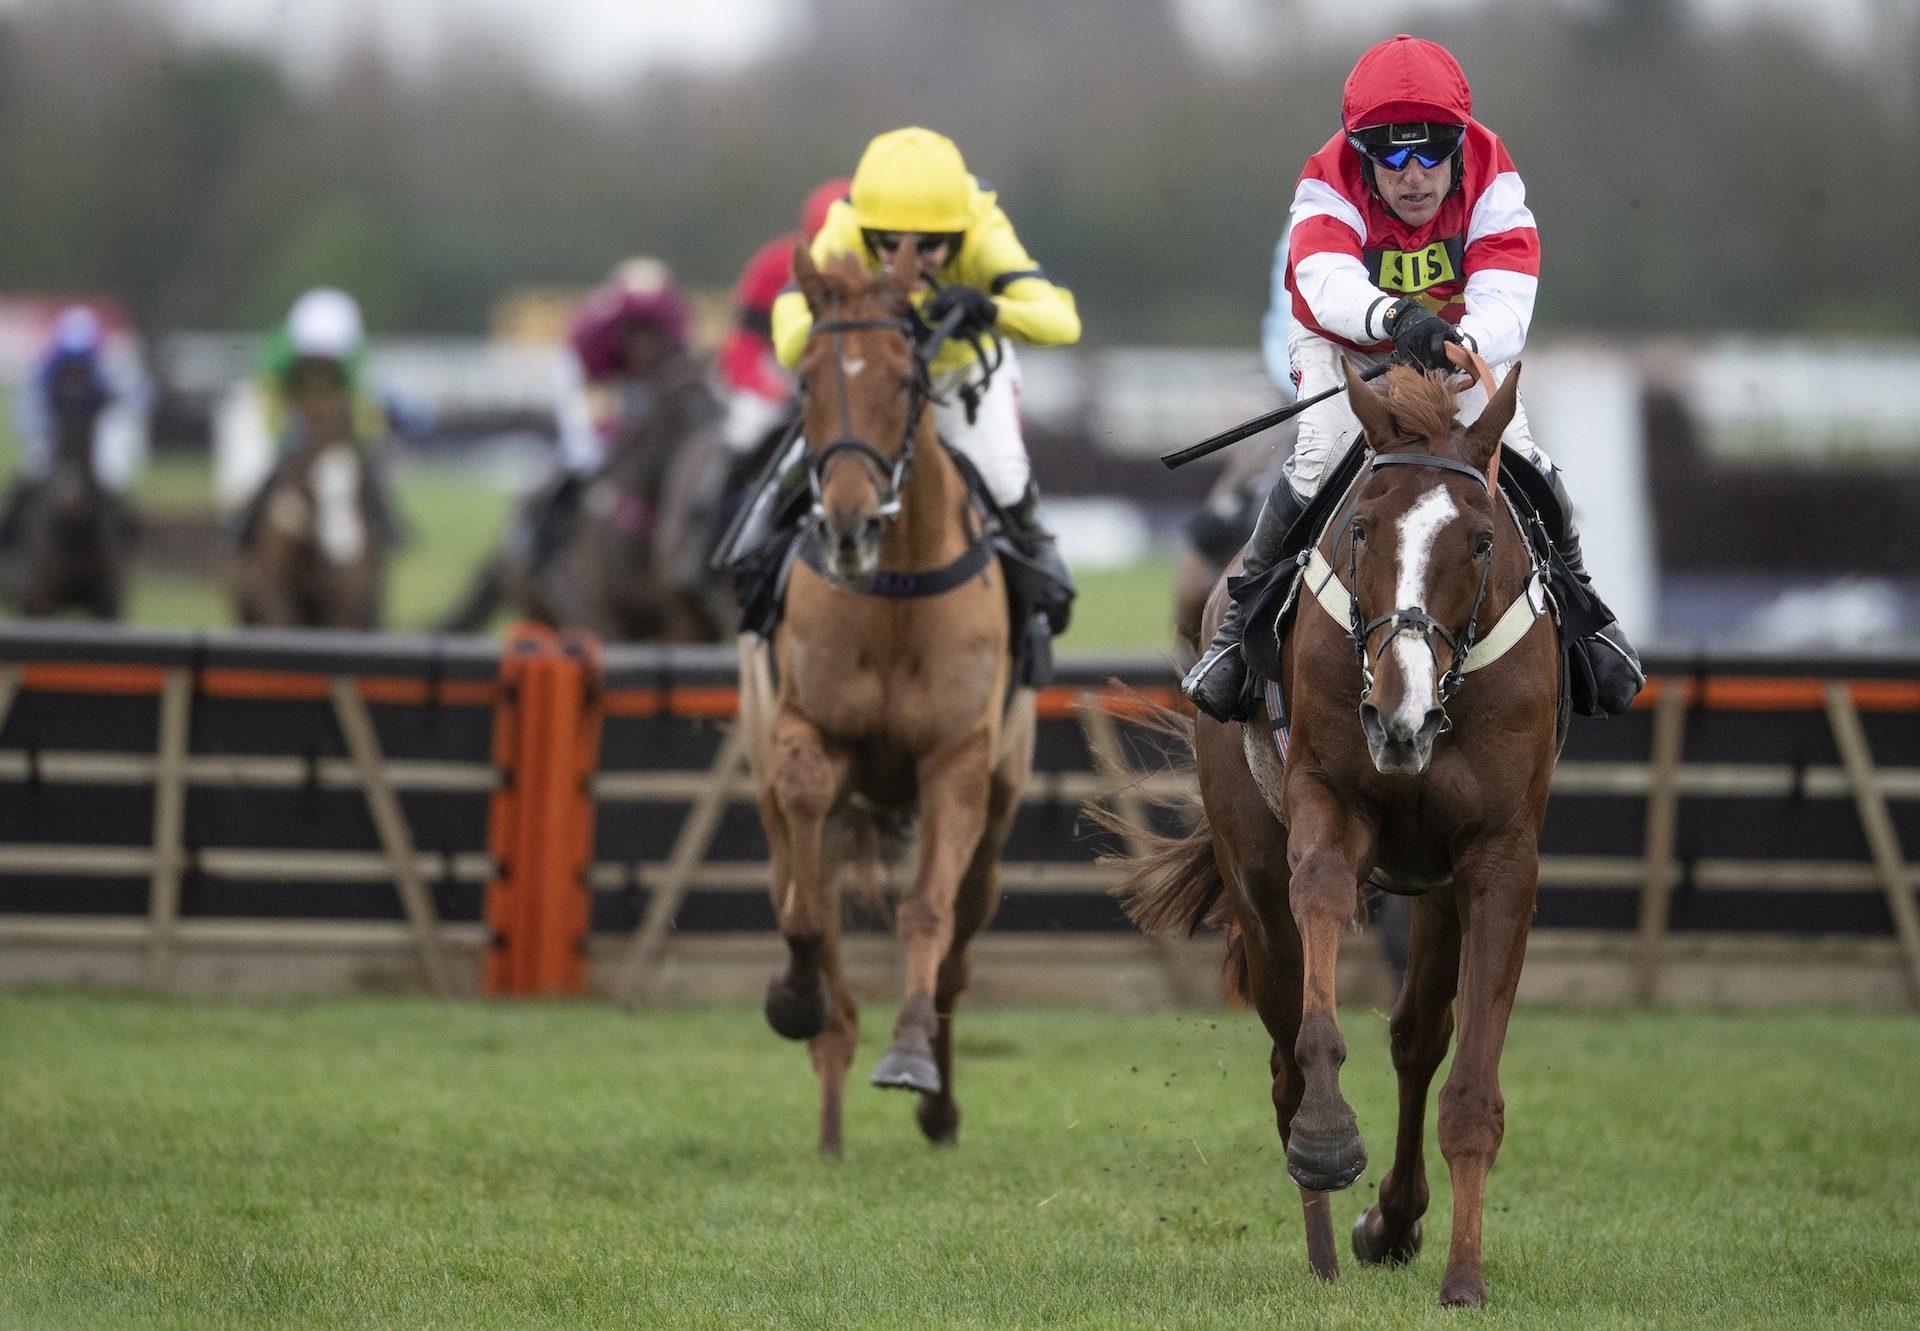 The Big Breakaway (Getaway) Brings His Unbeaten Run To Three at Newbury